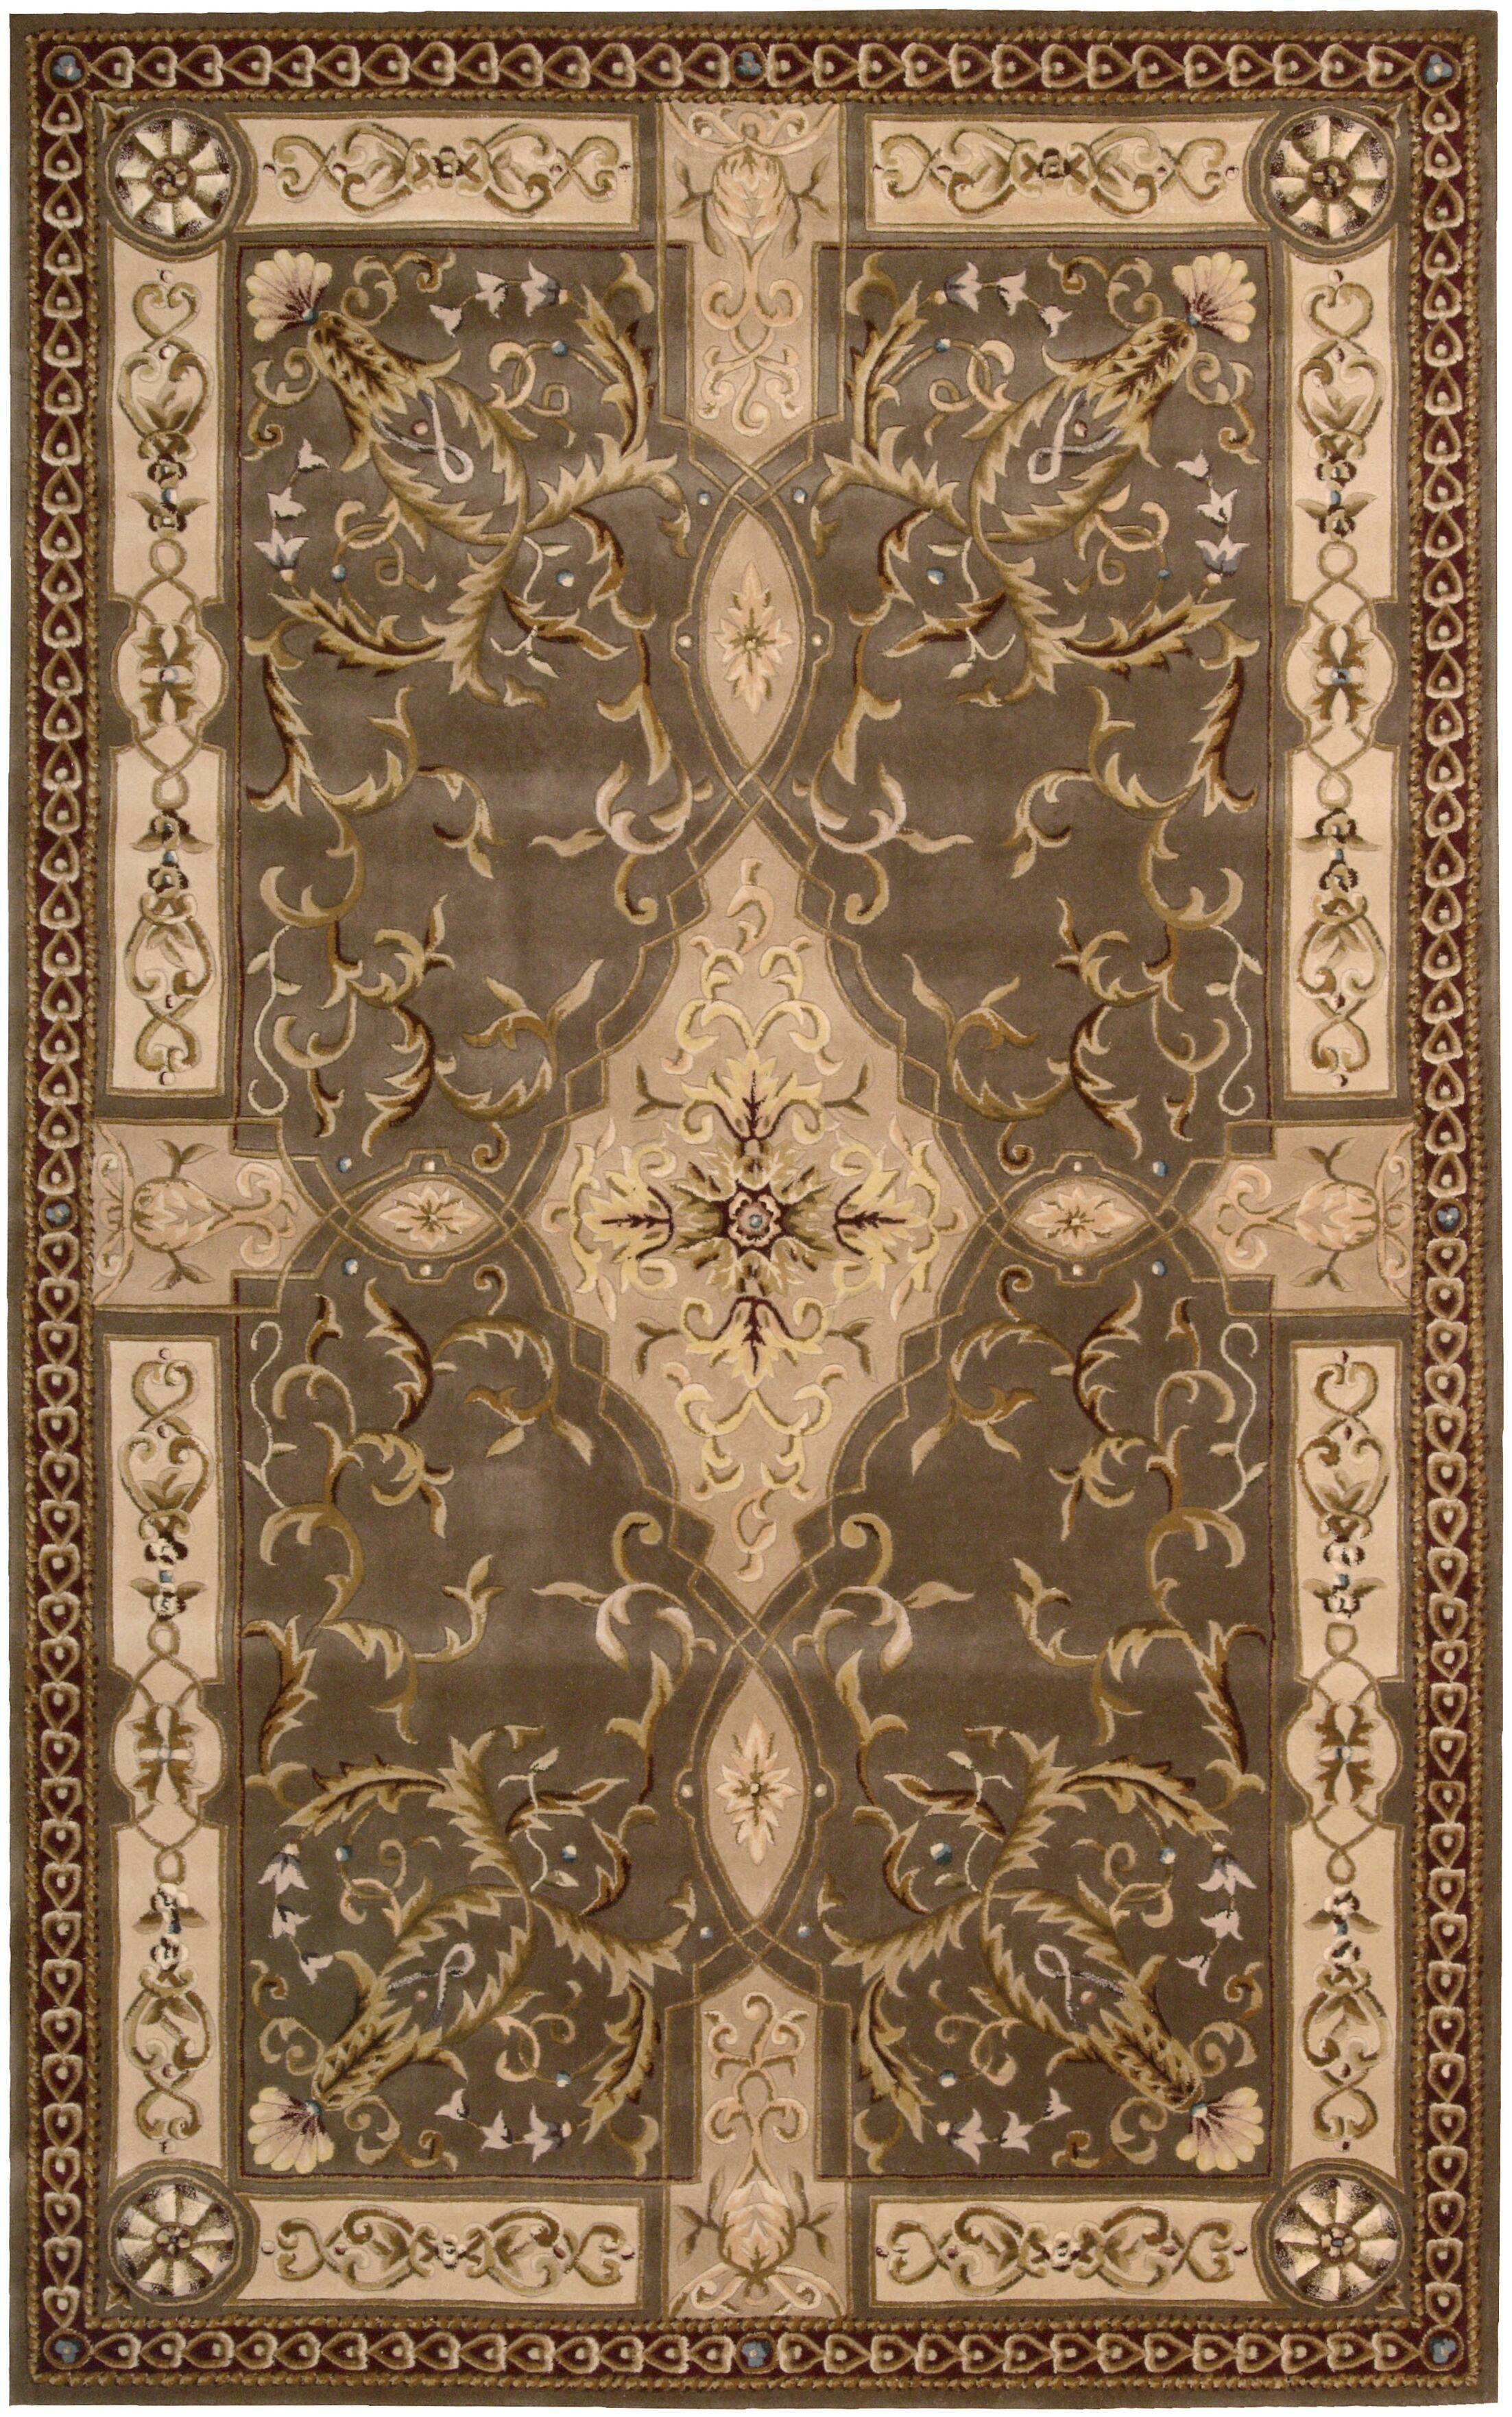 Brownlee Oriental Brown/Tan Area Rug Rug Size: Rectangle 7'6